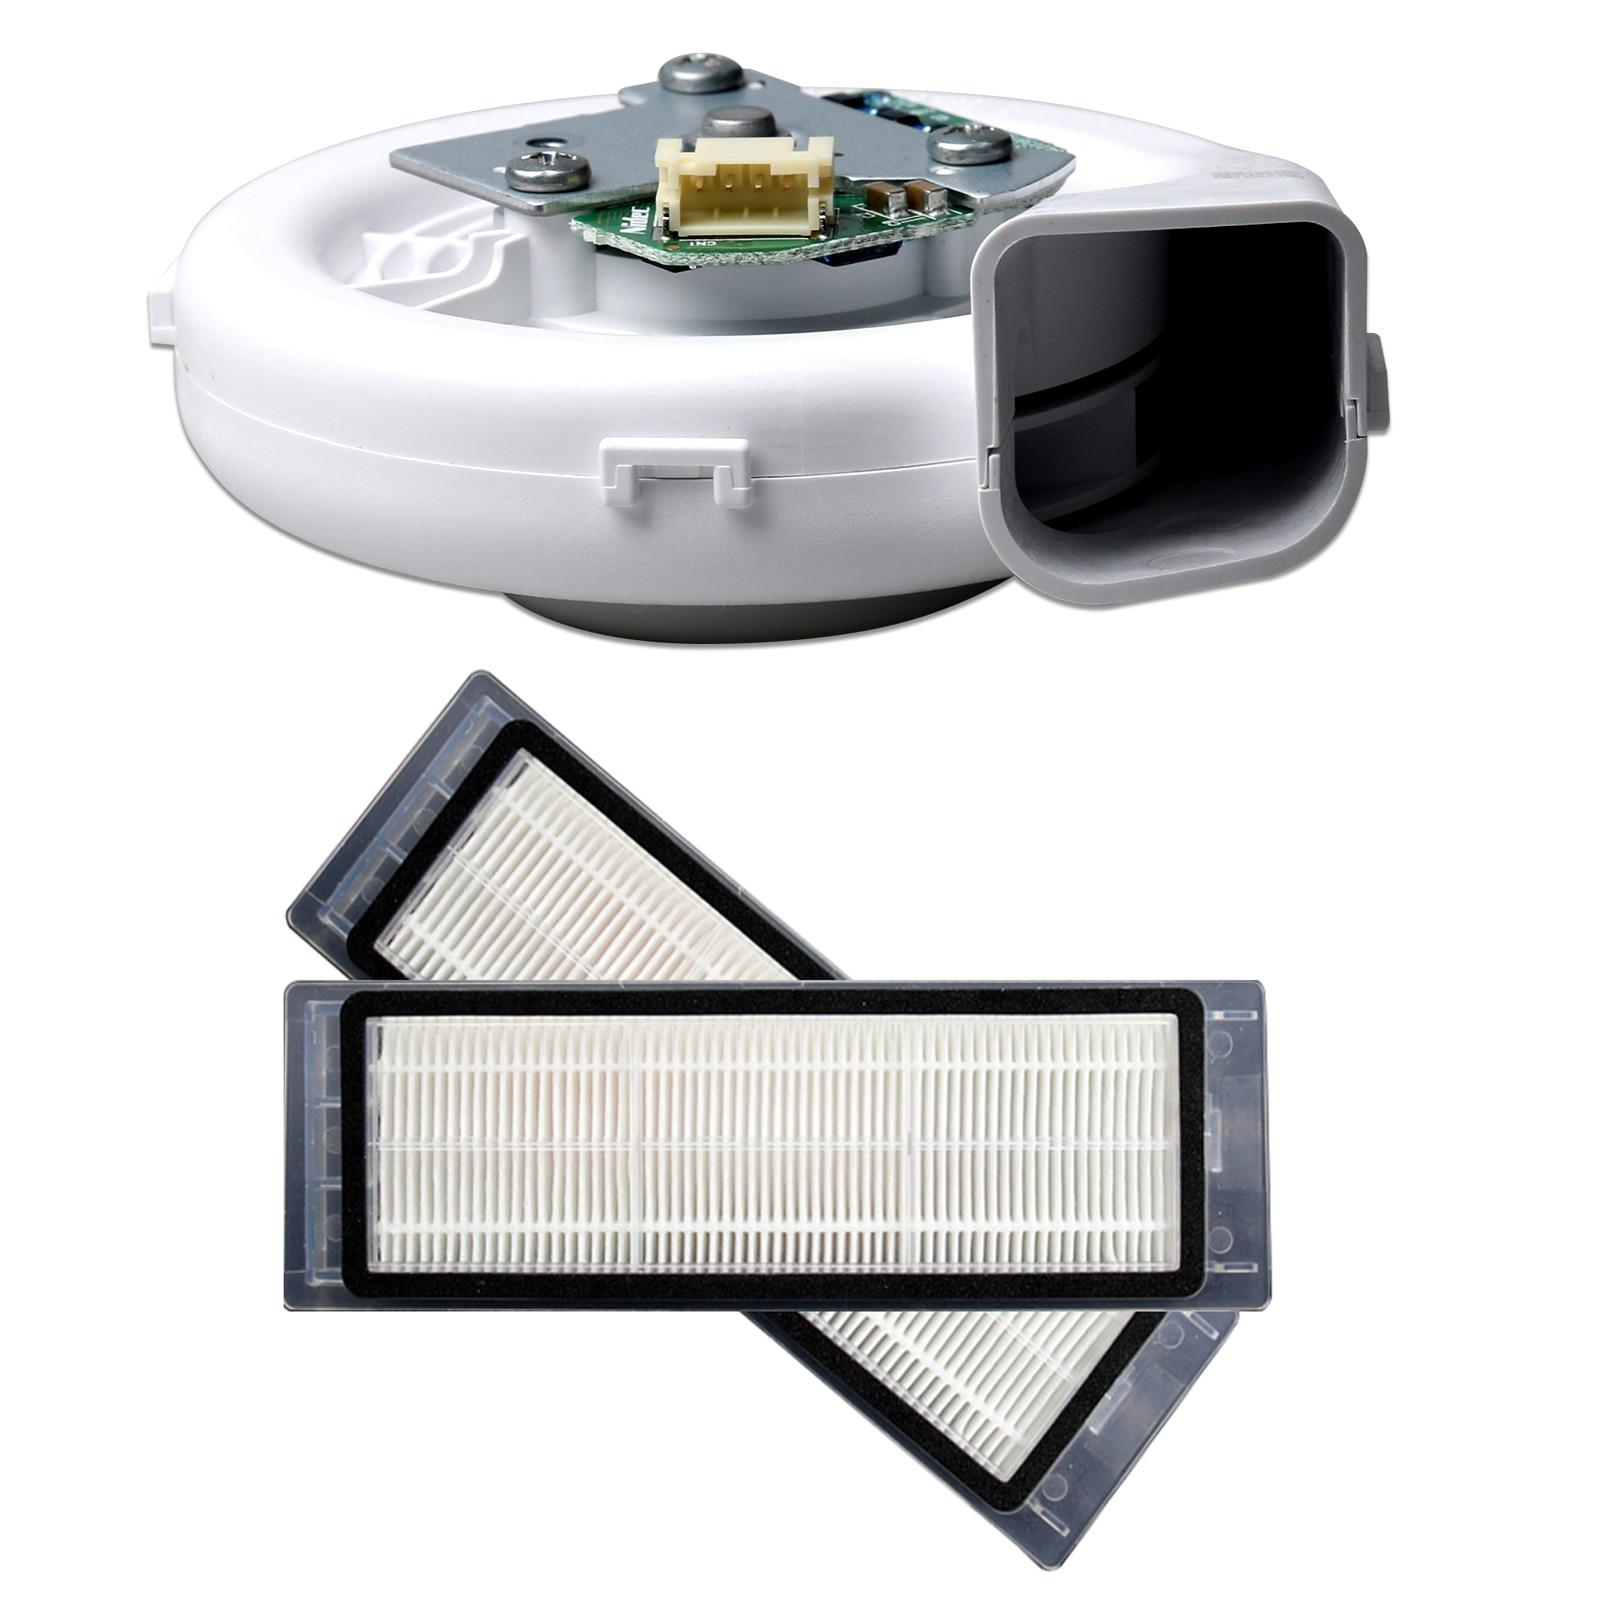 3pcs/set Original Engine ventilator fan motor Washable Vacuum Cleaner HEPA Filter for Xiaomi 2nd Gen Roborock S50 S51 S55 Vacuum